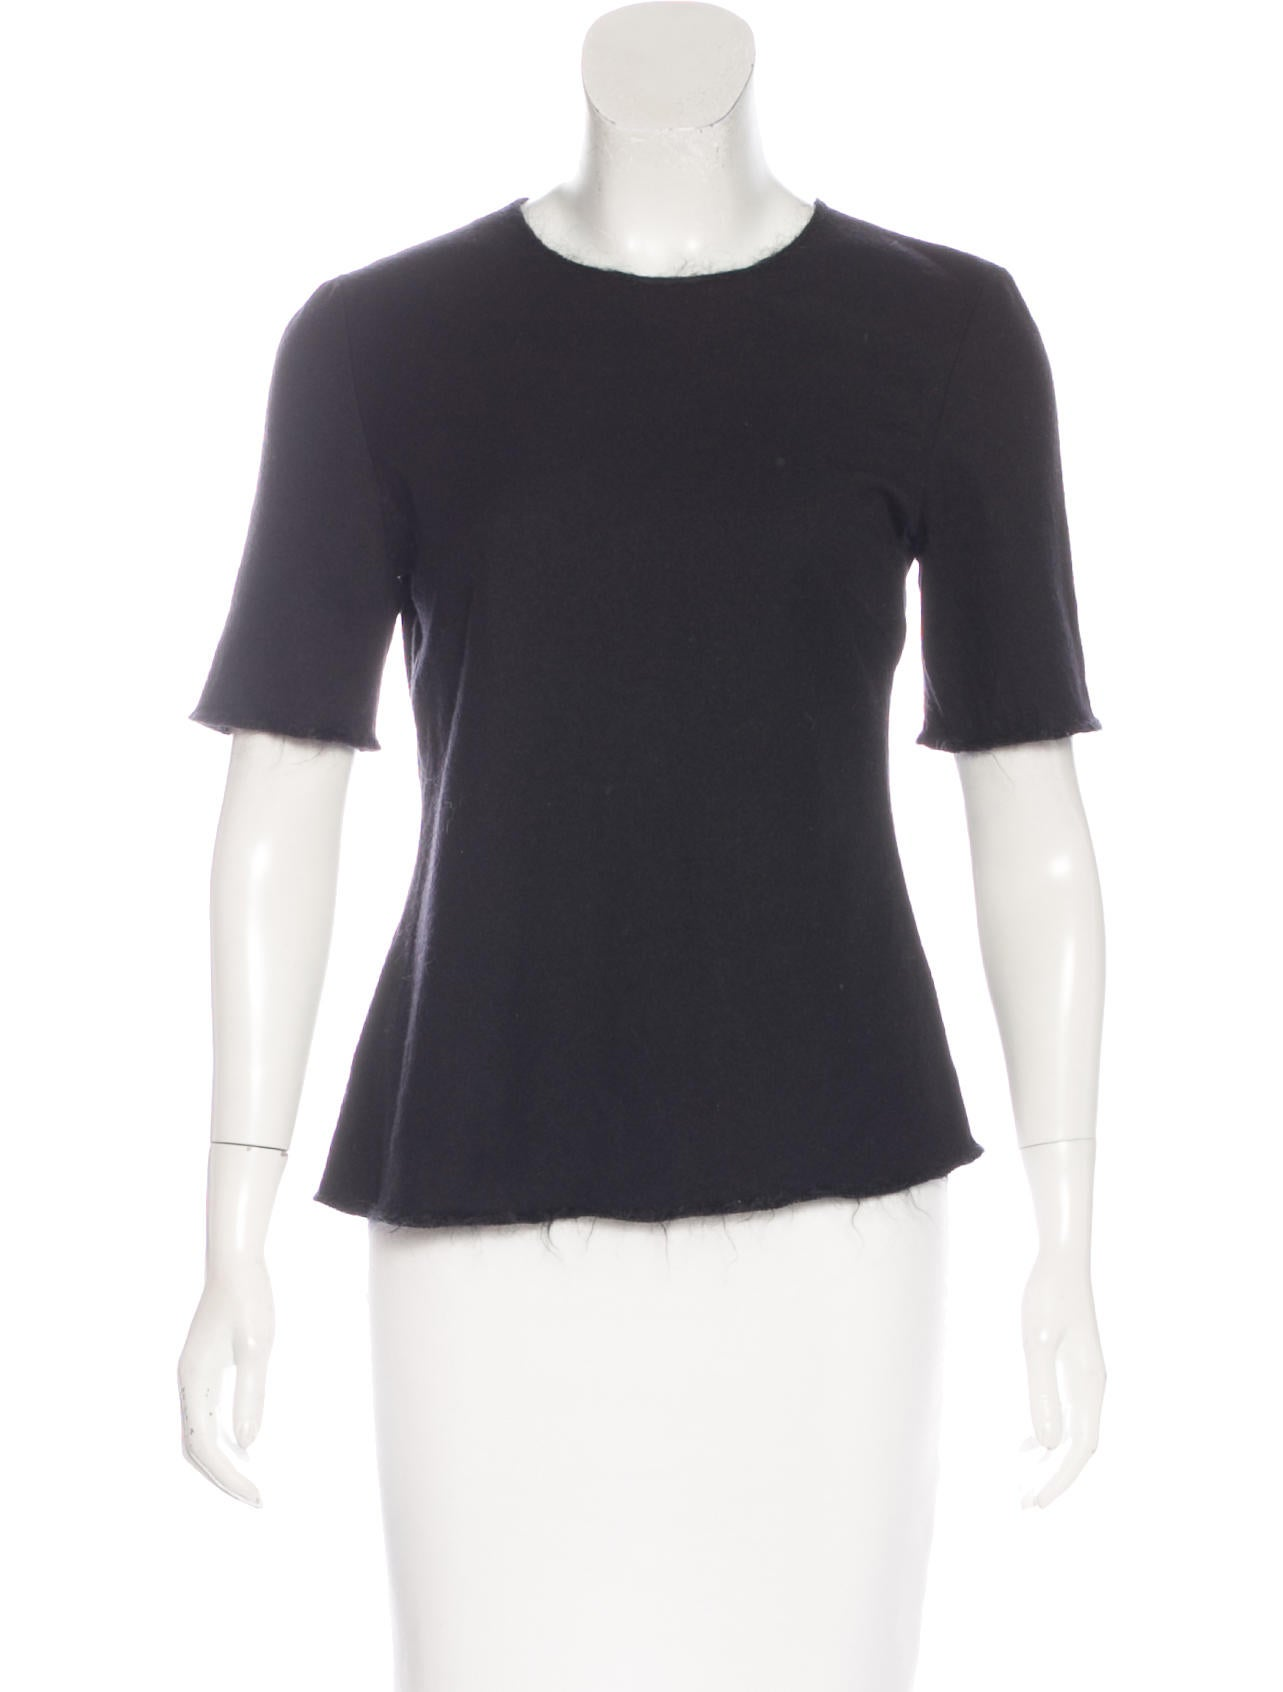 Prada wool short sleeve top clothing pra144299 the for Best wool shirt jackets